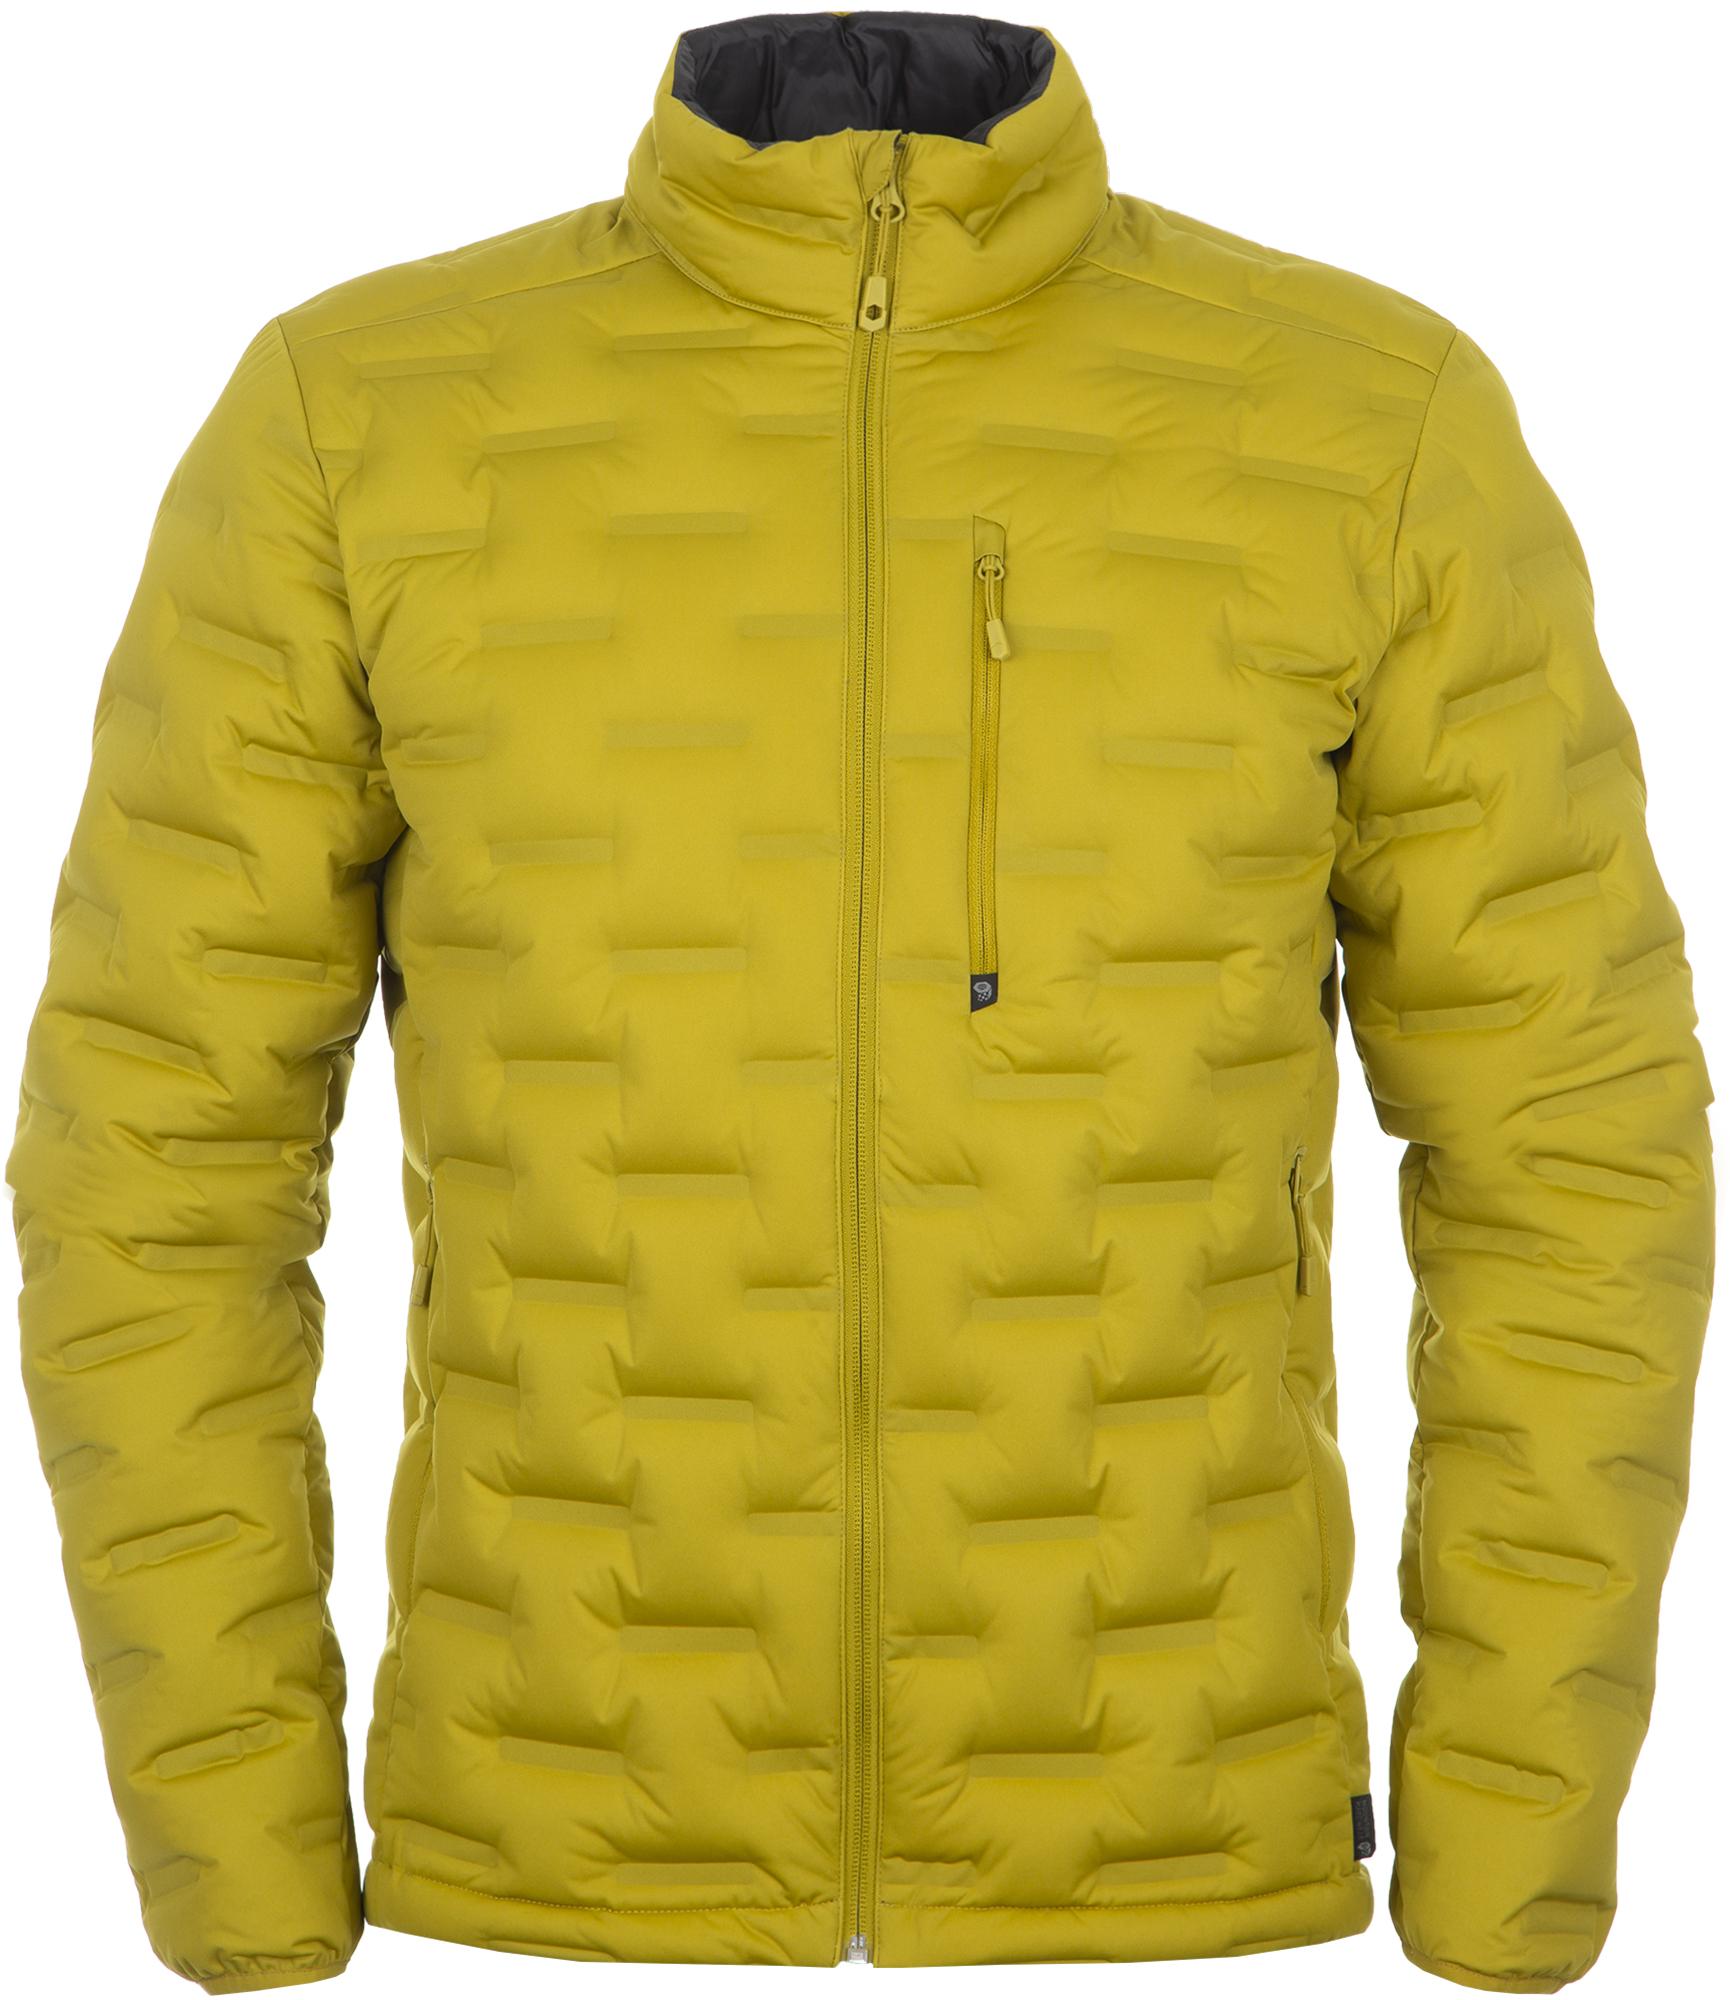 Mountain Hardwear Куртка пуховая мужская Mountain Hardwear Stretchdown DS, размер 56 куртка для мотоциклистов ds atv